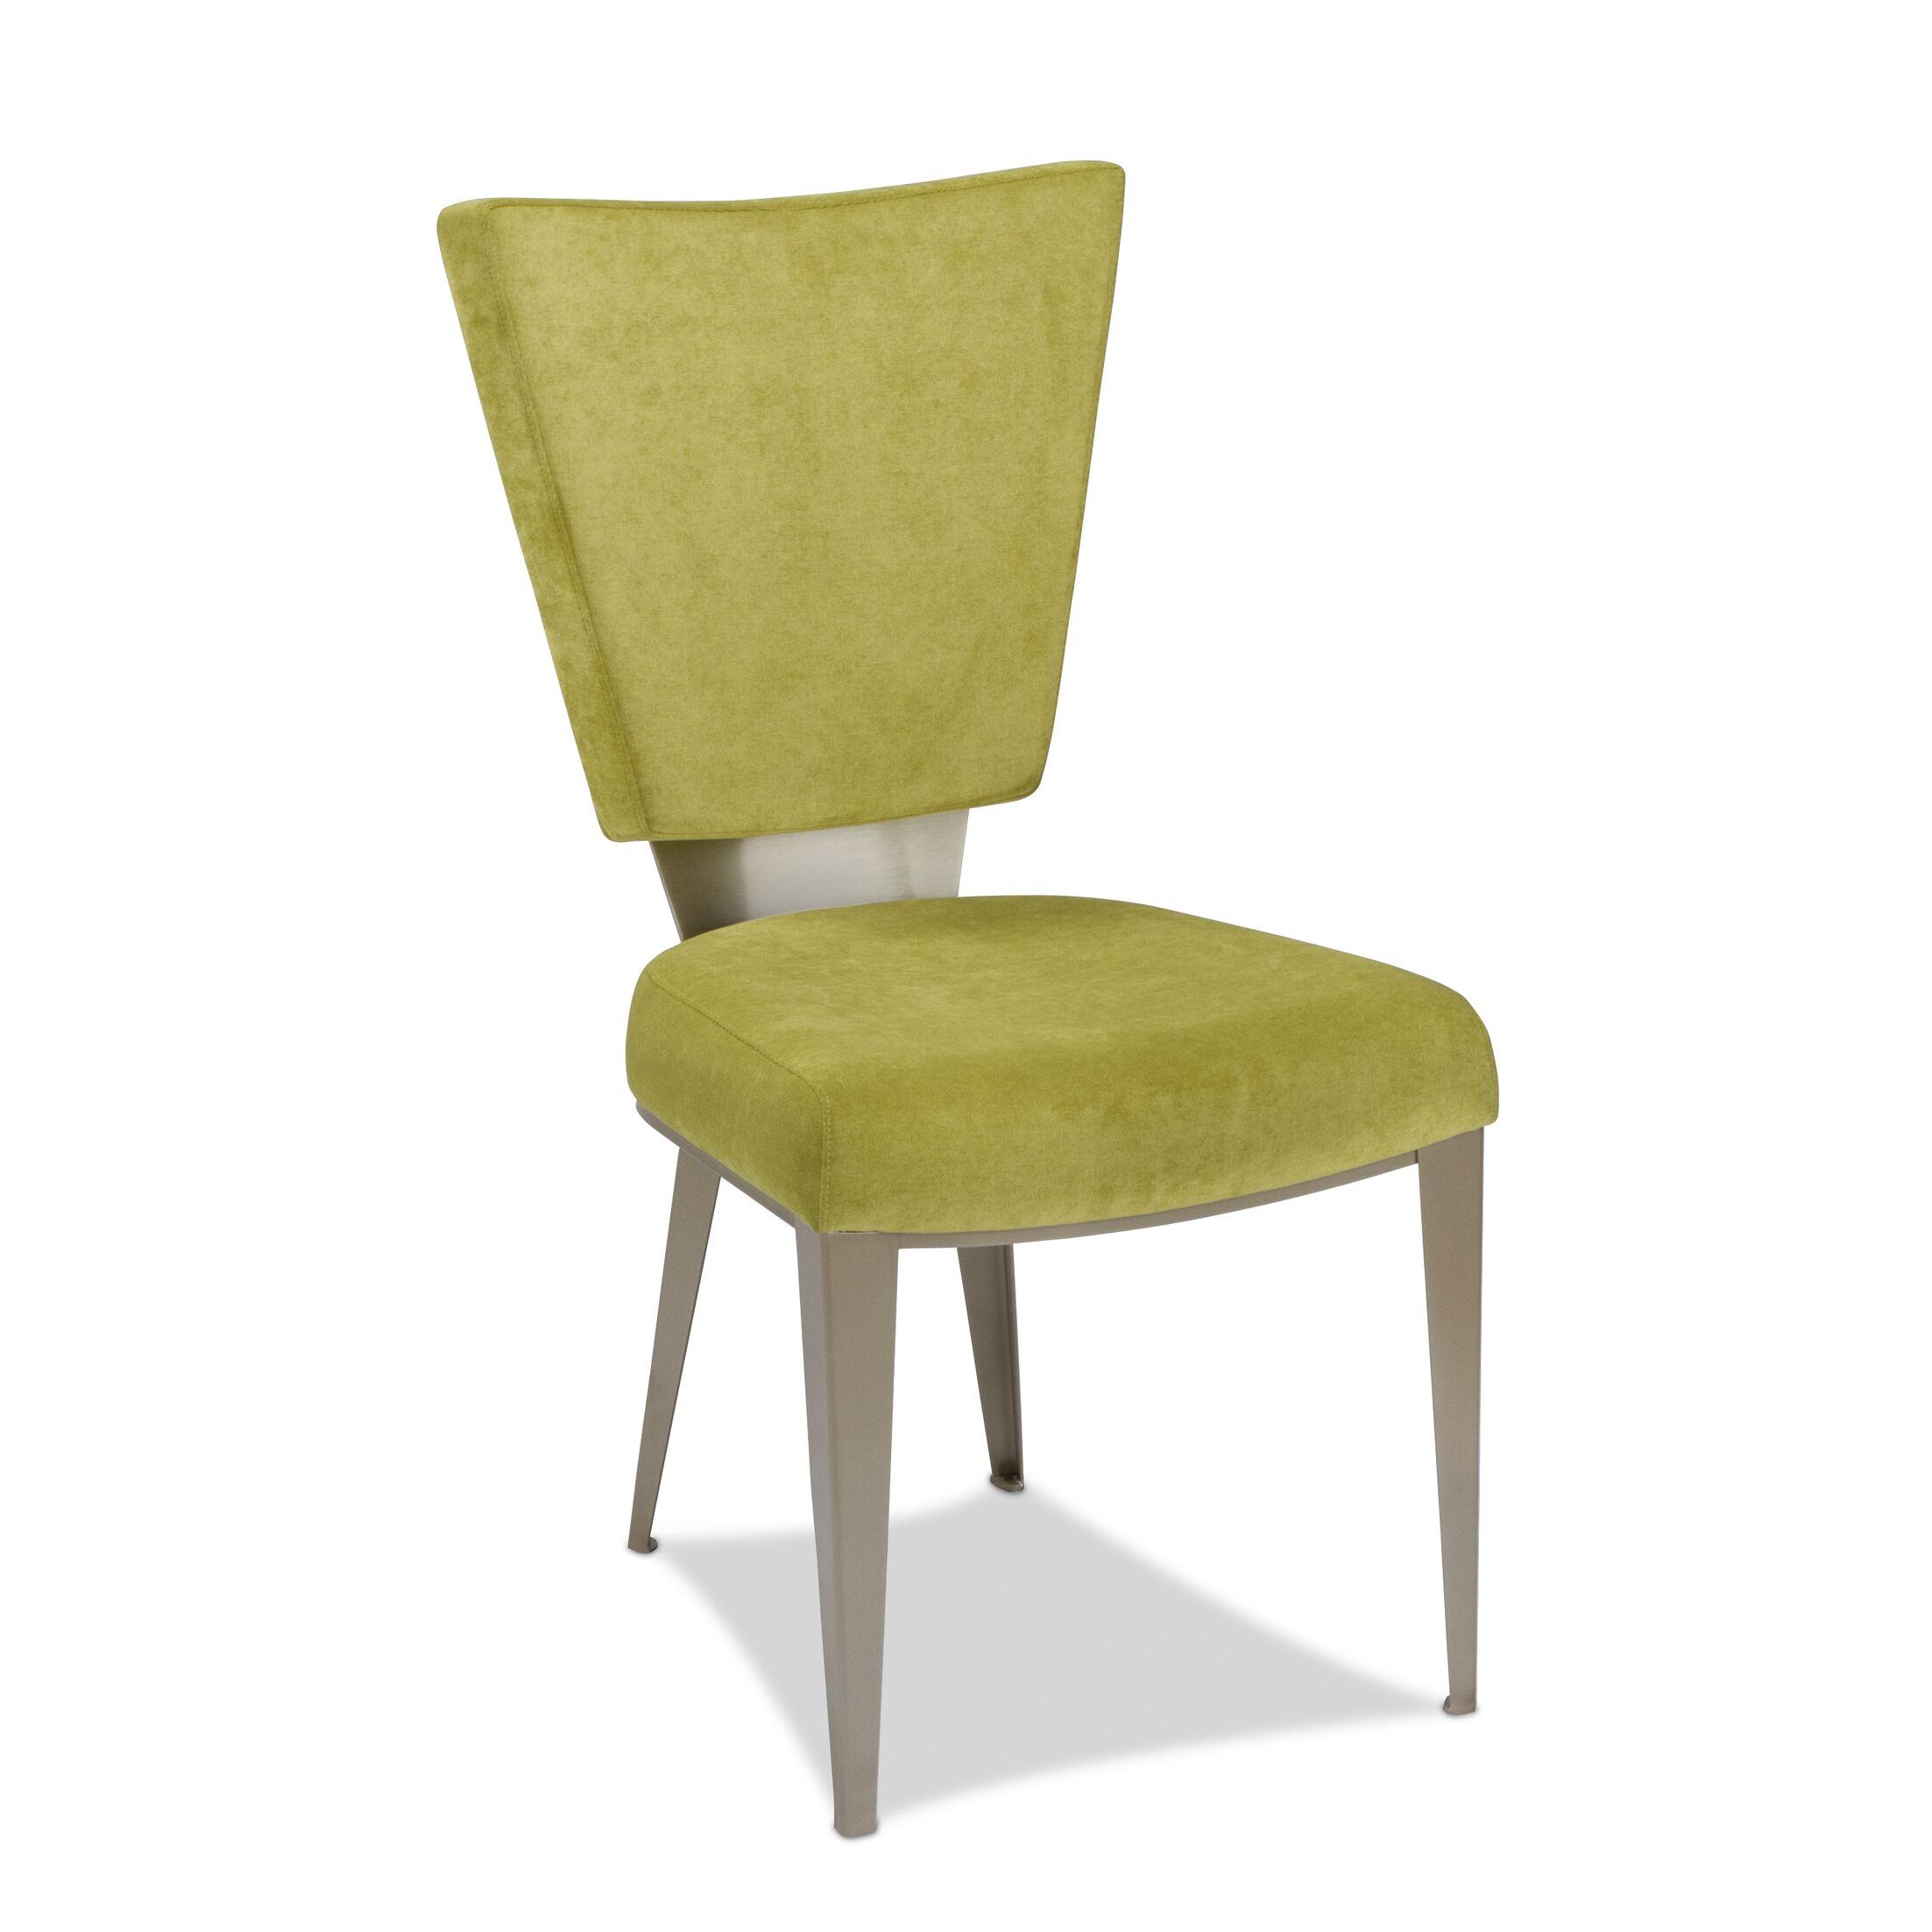 Monroe Upholstered Dining Chair Upholstery: Fudge